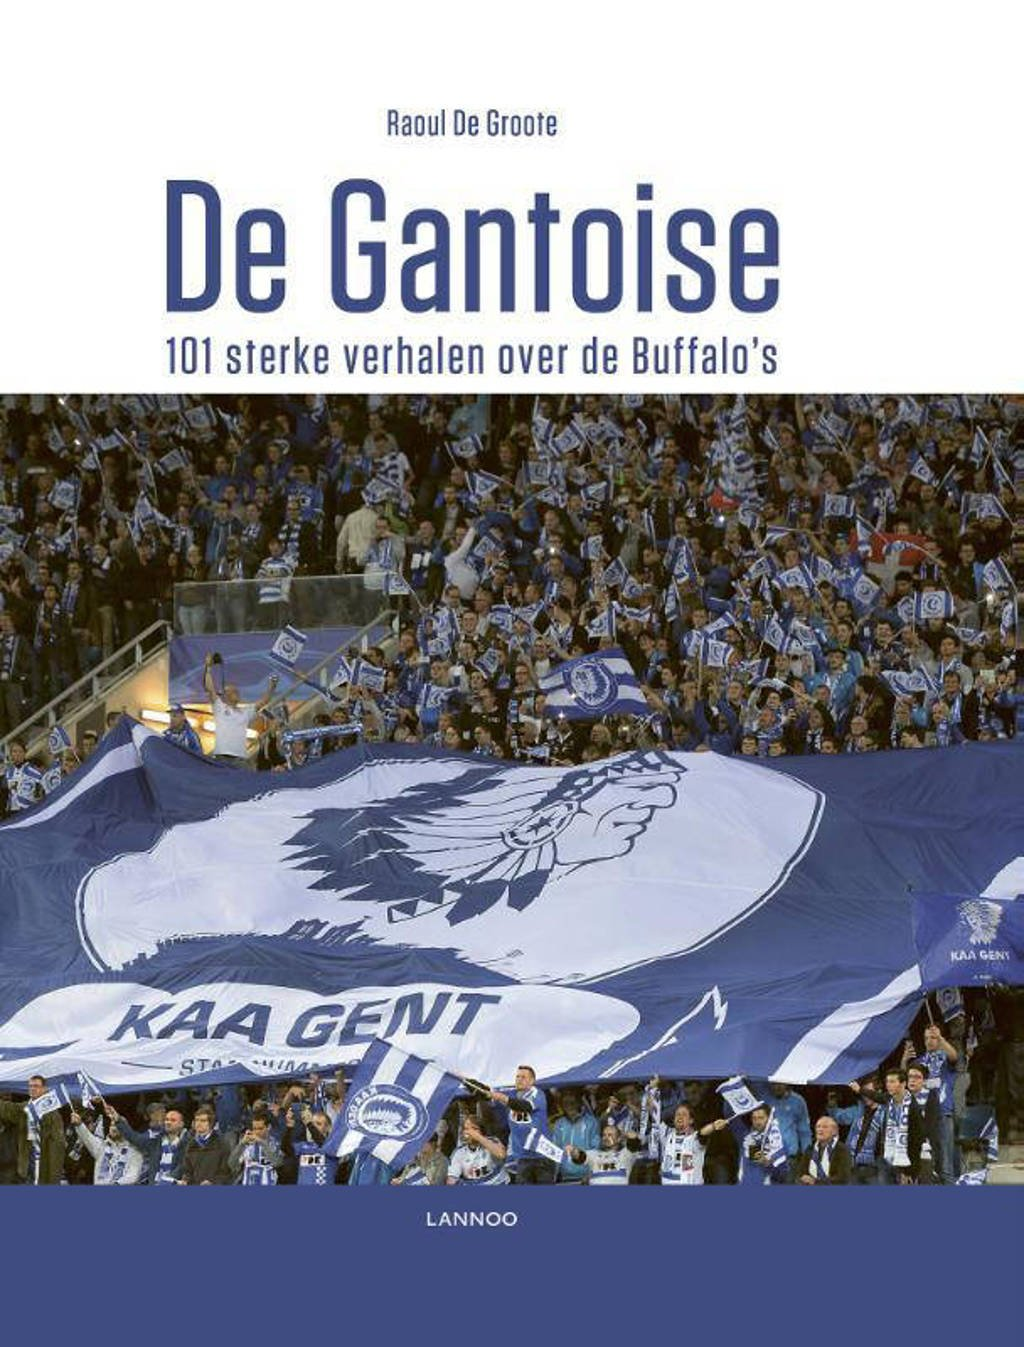 De Gantoise - Raoul De Groote